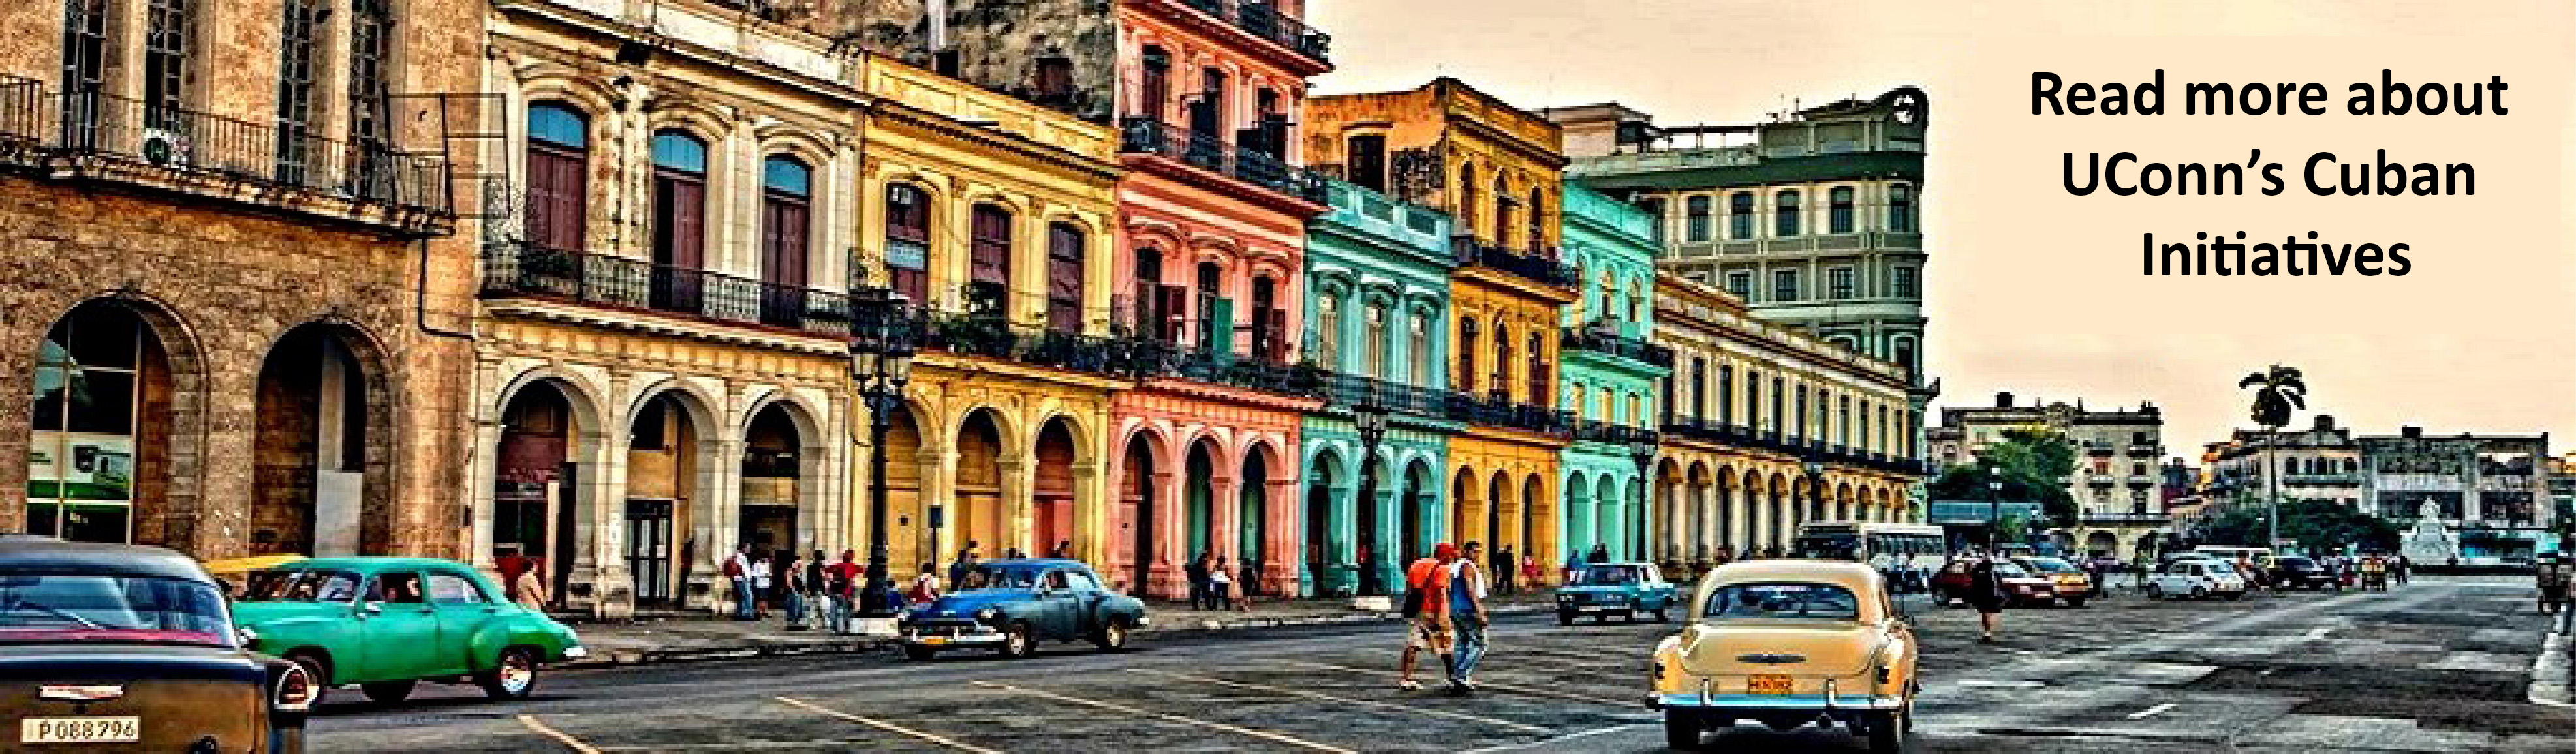 cuban_streets